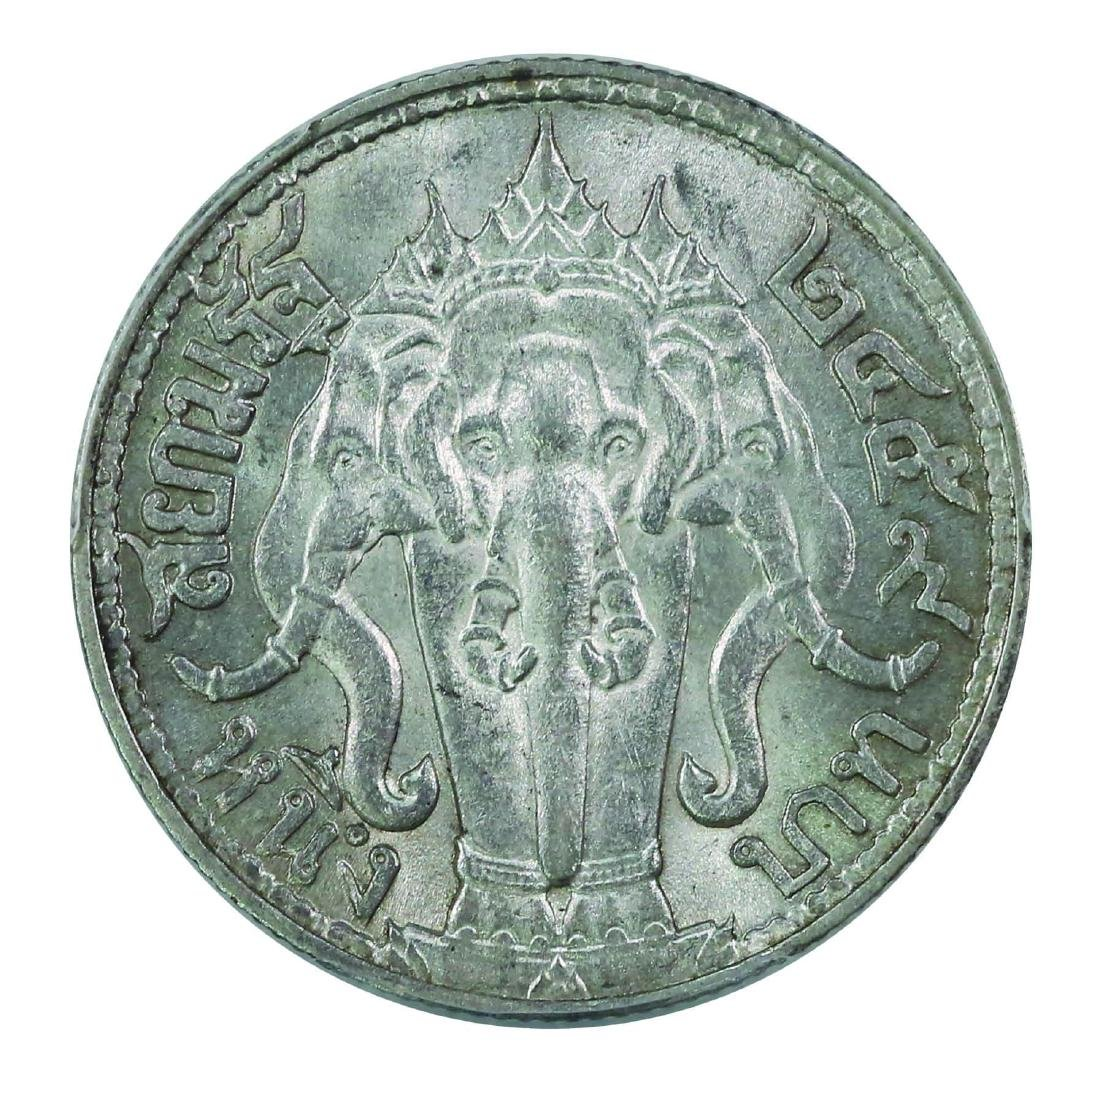 Thailand BE 2459, 1 Baht PCGS AU58 - 2